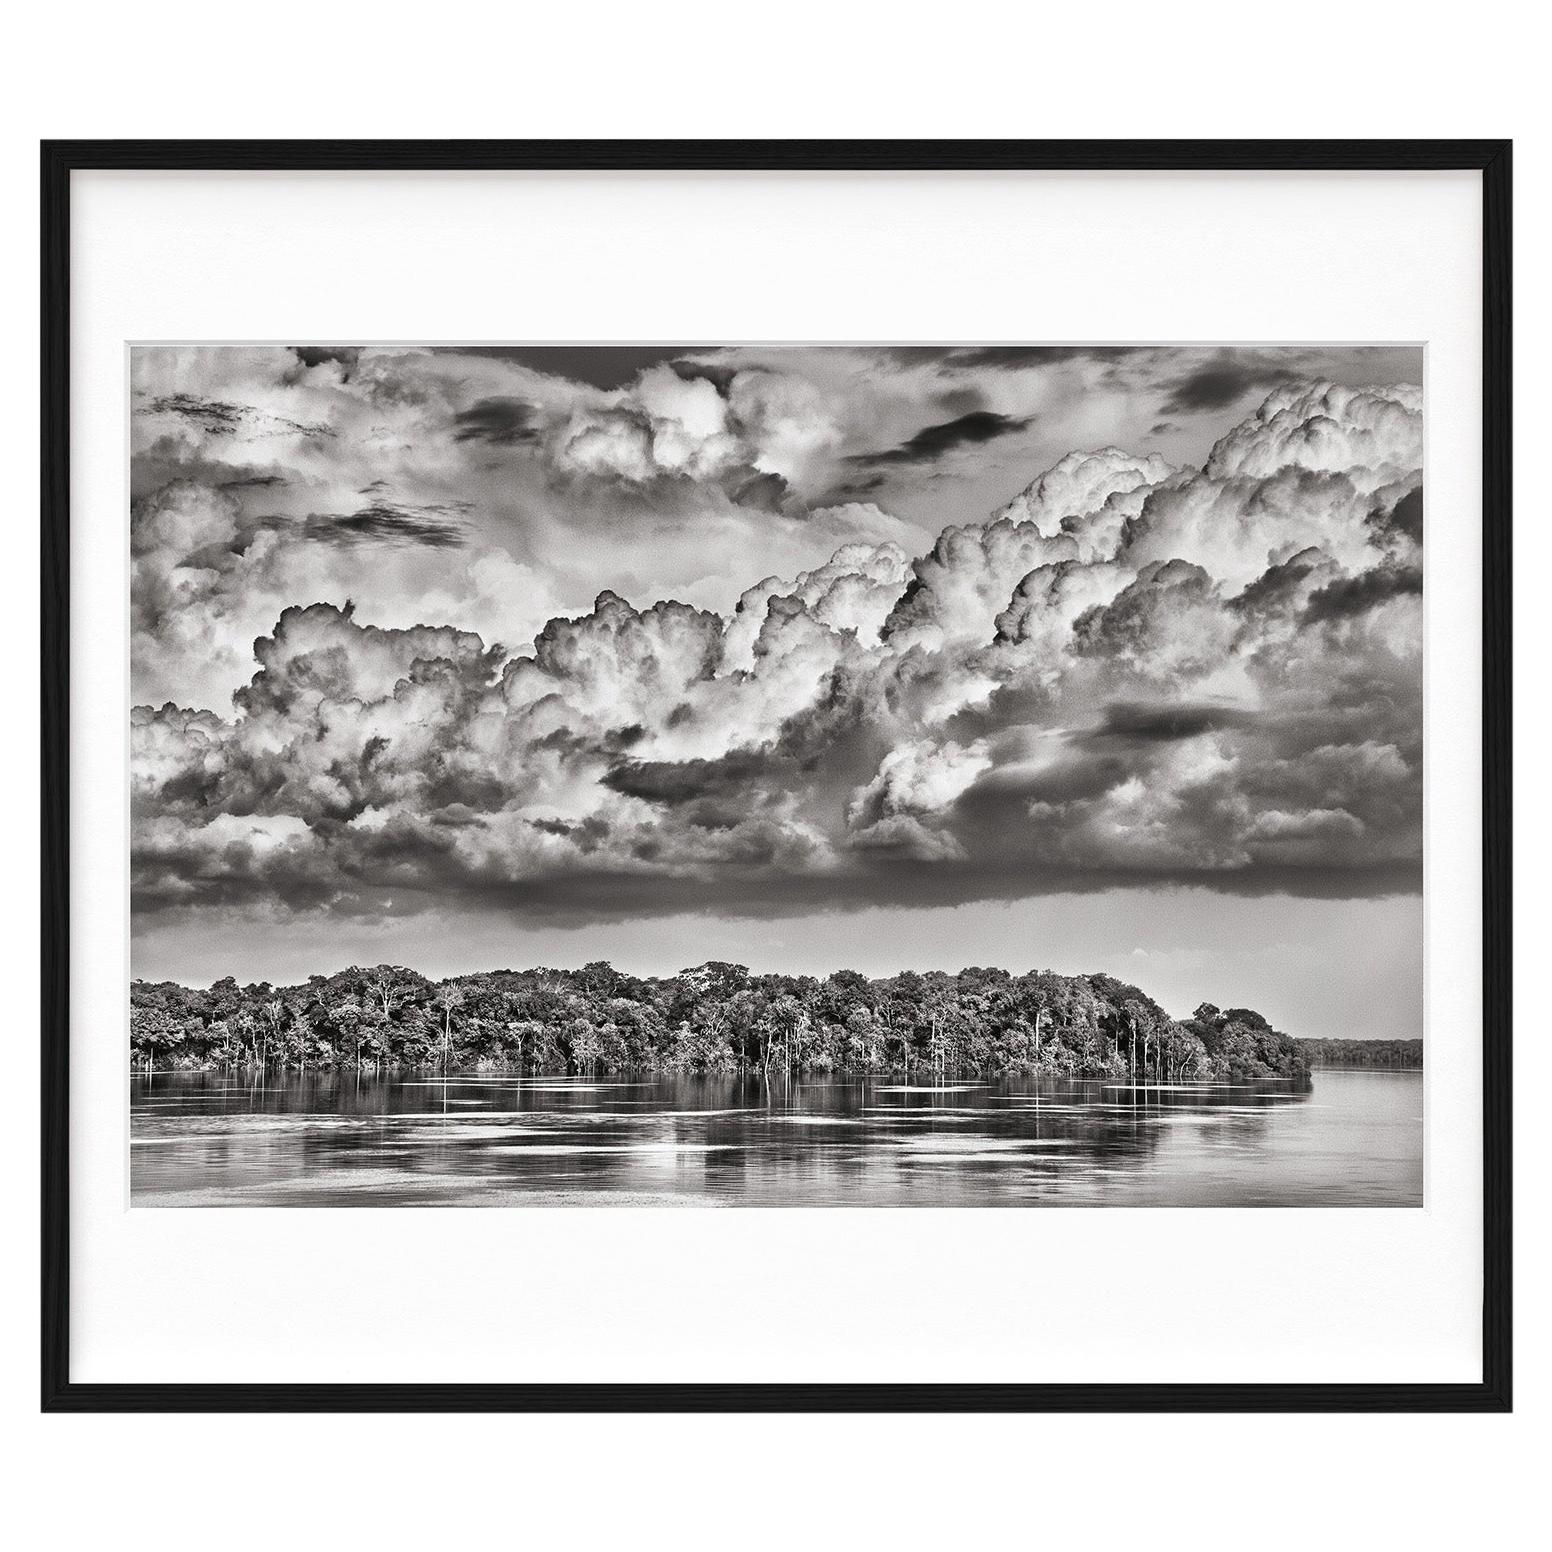 Salgado, Amazônia Art D, Signed Sumo Book with Black & White Photographic Print